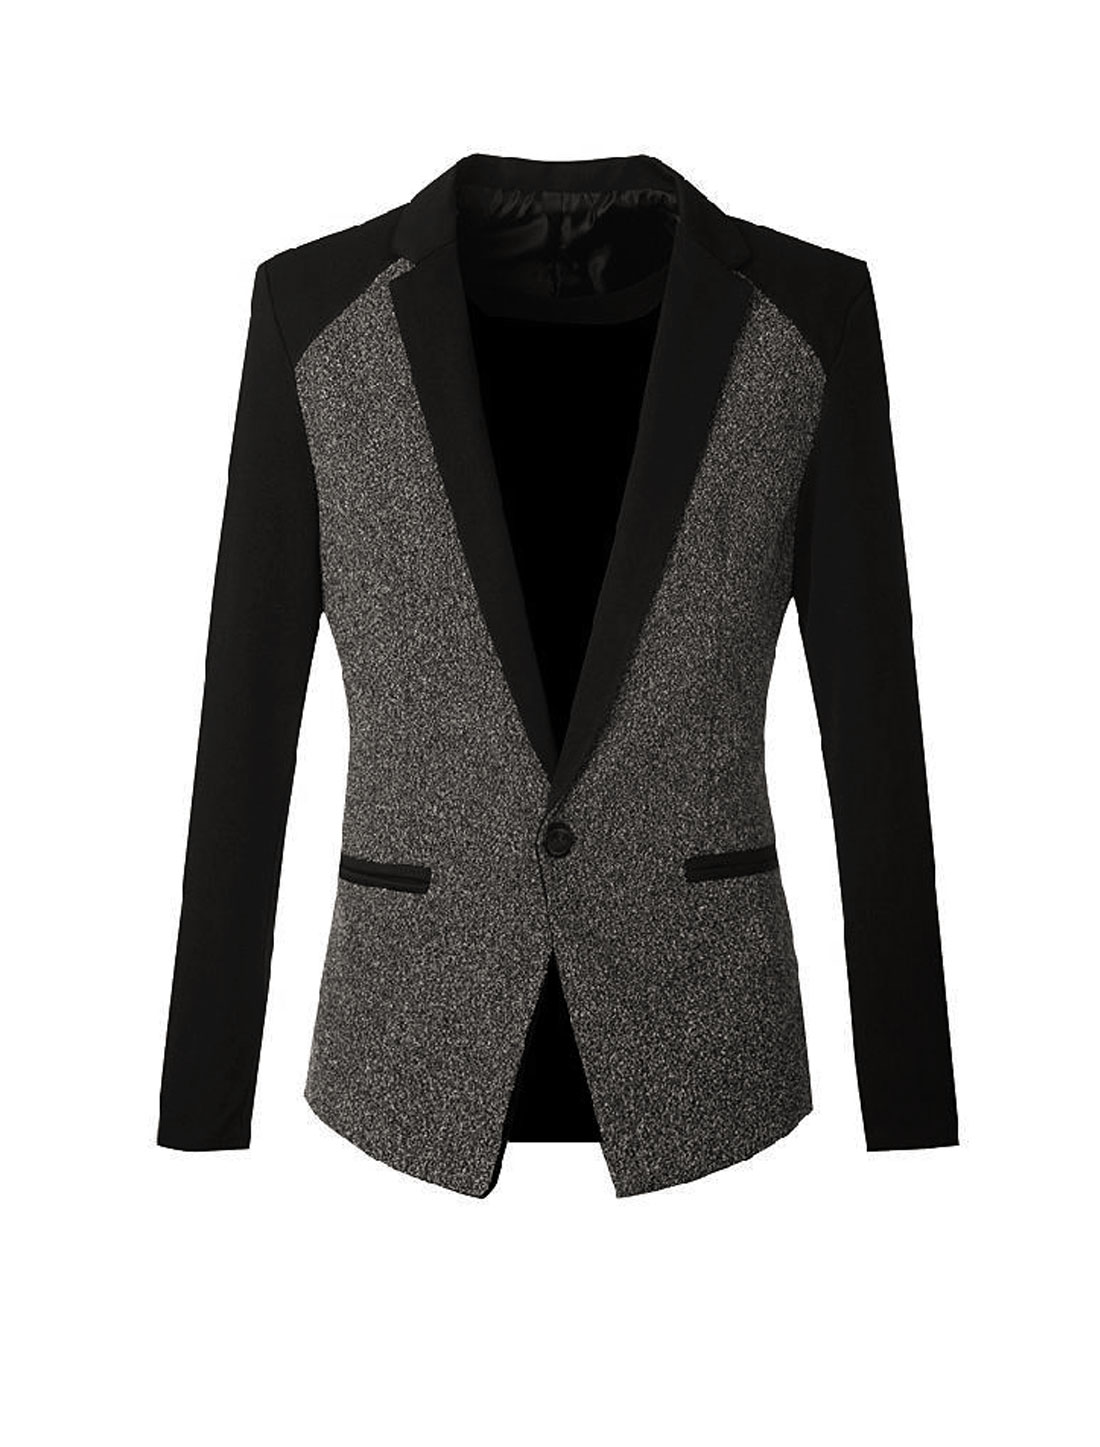 Men Notched Lapel Color Block Premium Blazer Jacket Dark Gray S